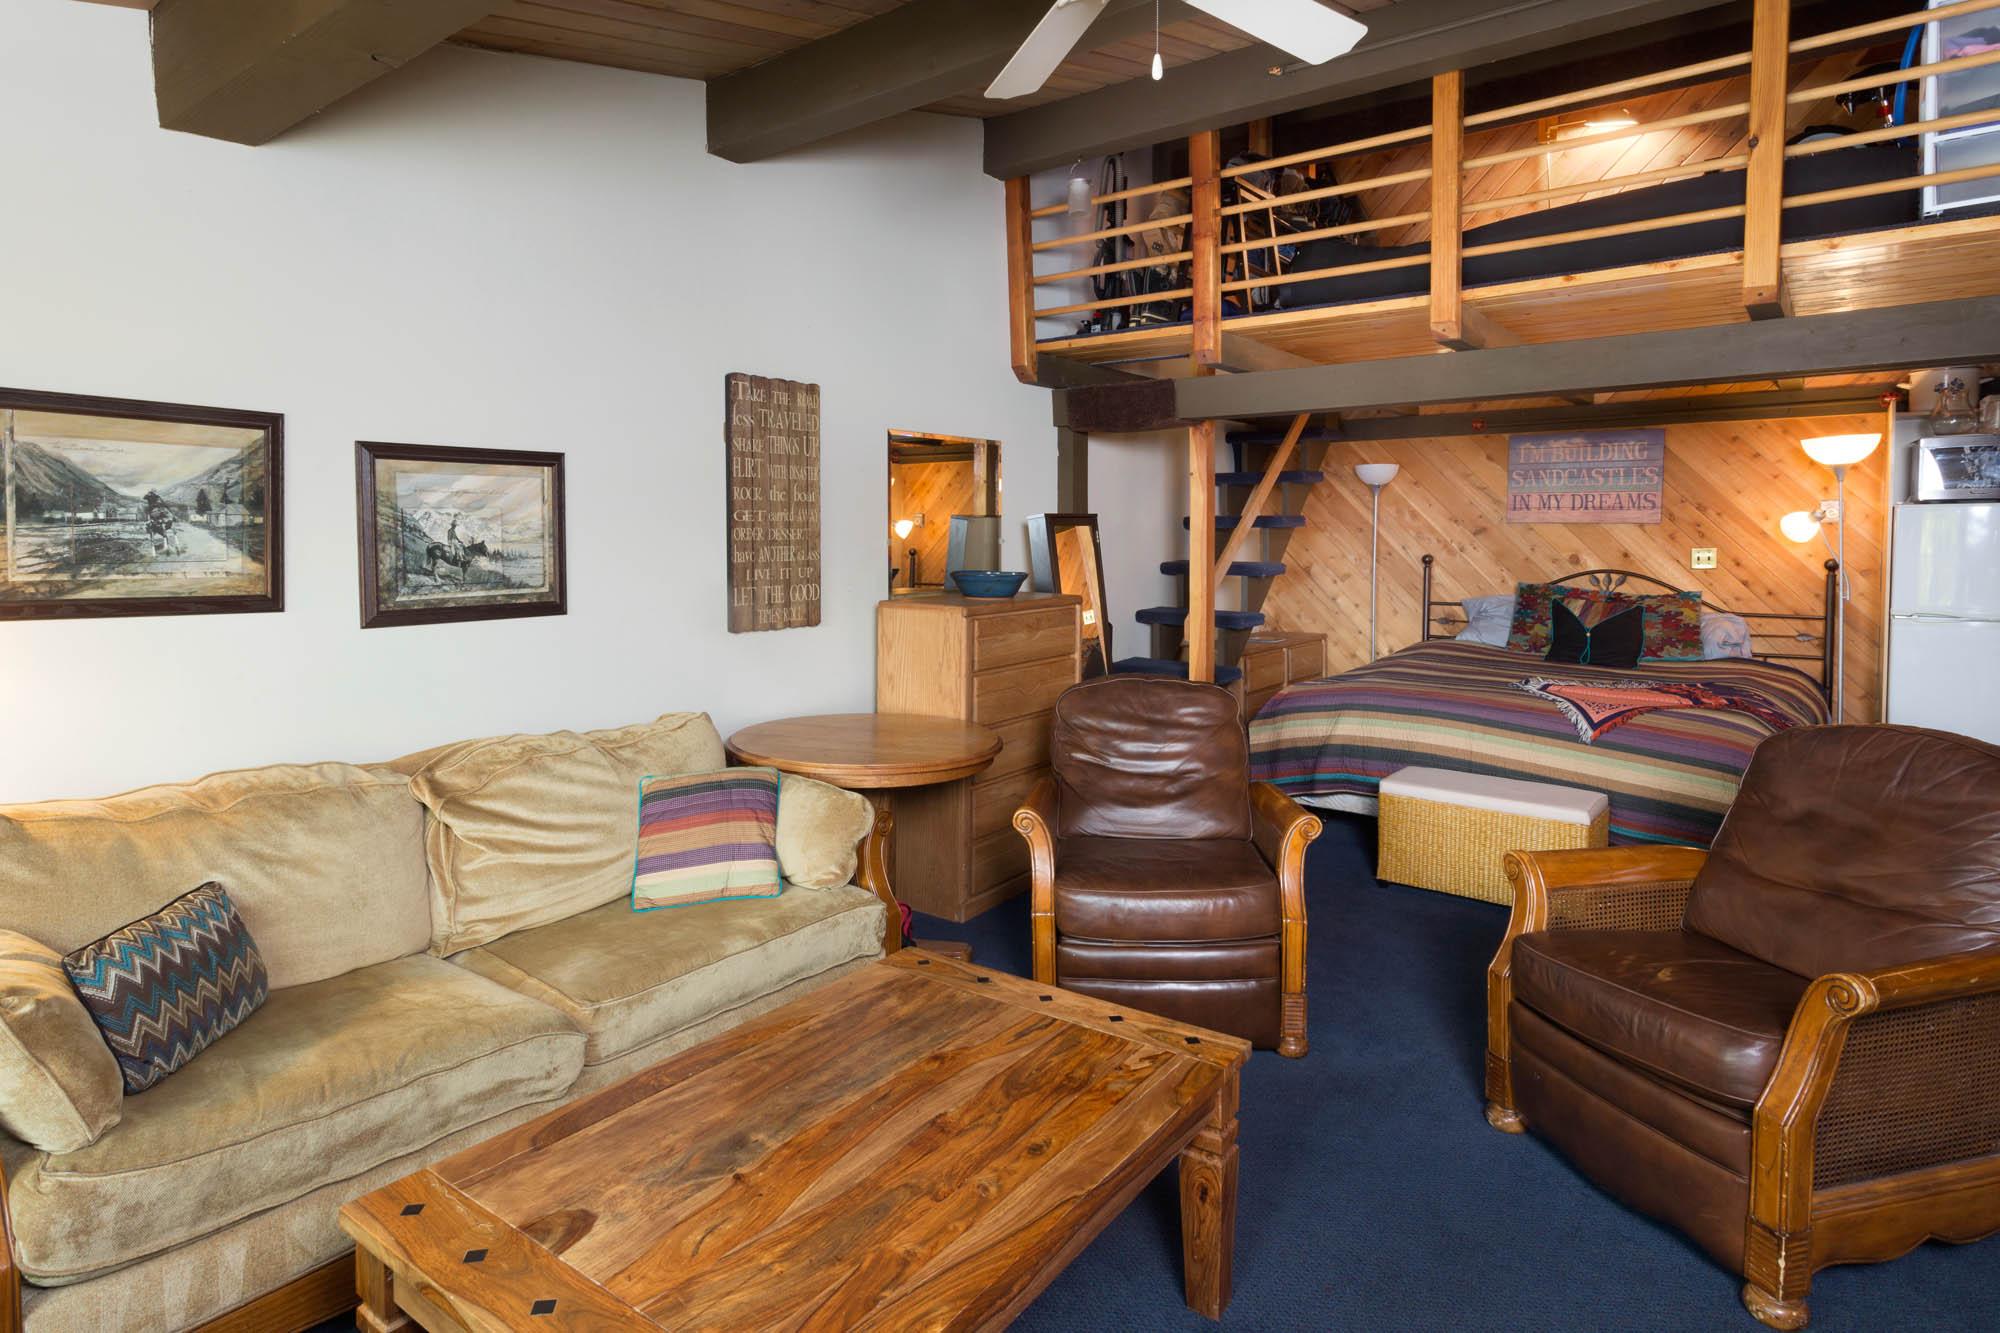 Condominium for Sale at Aspenwood L-12 600 Carriage Way Aspenwood L-12 Snowmass Village, Colorado 81615 United States